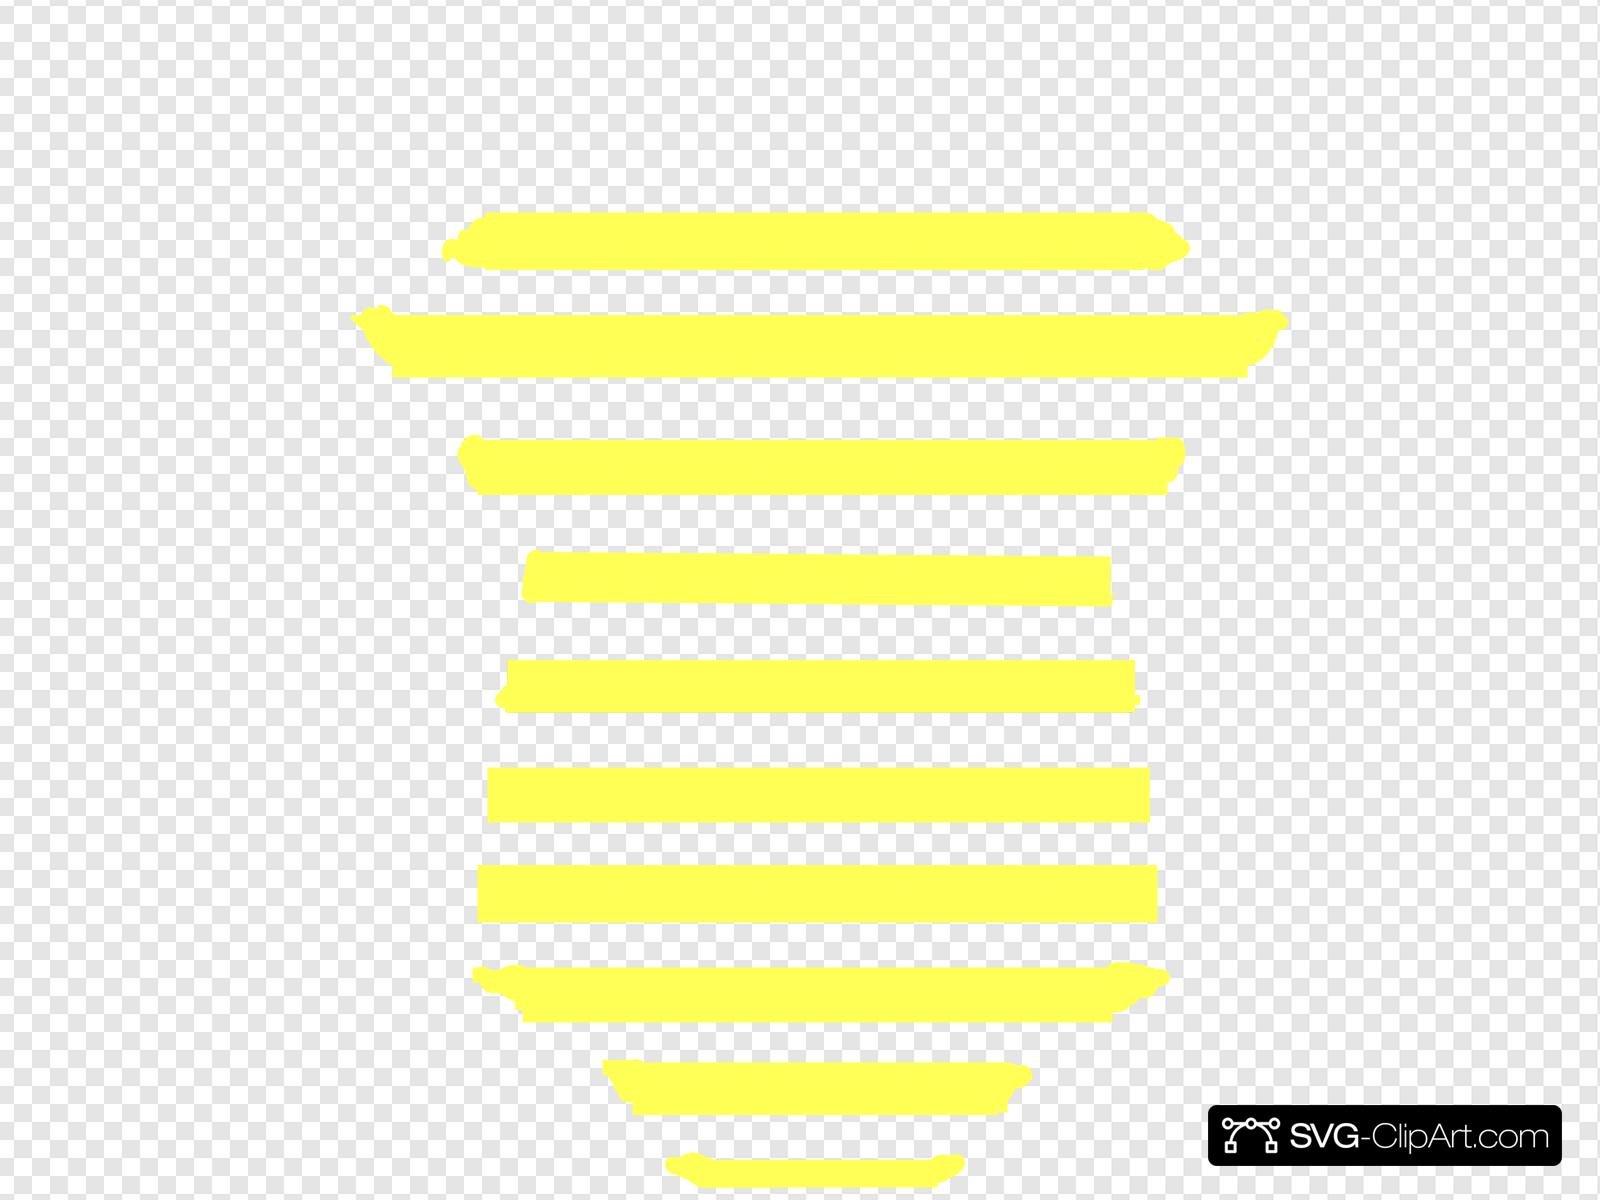 Yellow striped onesie clipart graphic black and white Yellow Striped Onesie Clip art, Icon and SVG - SVG Clipart graphic black and white